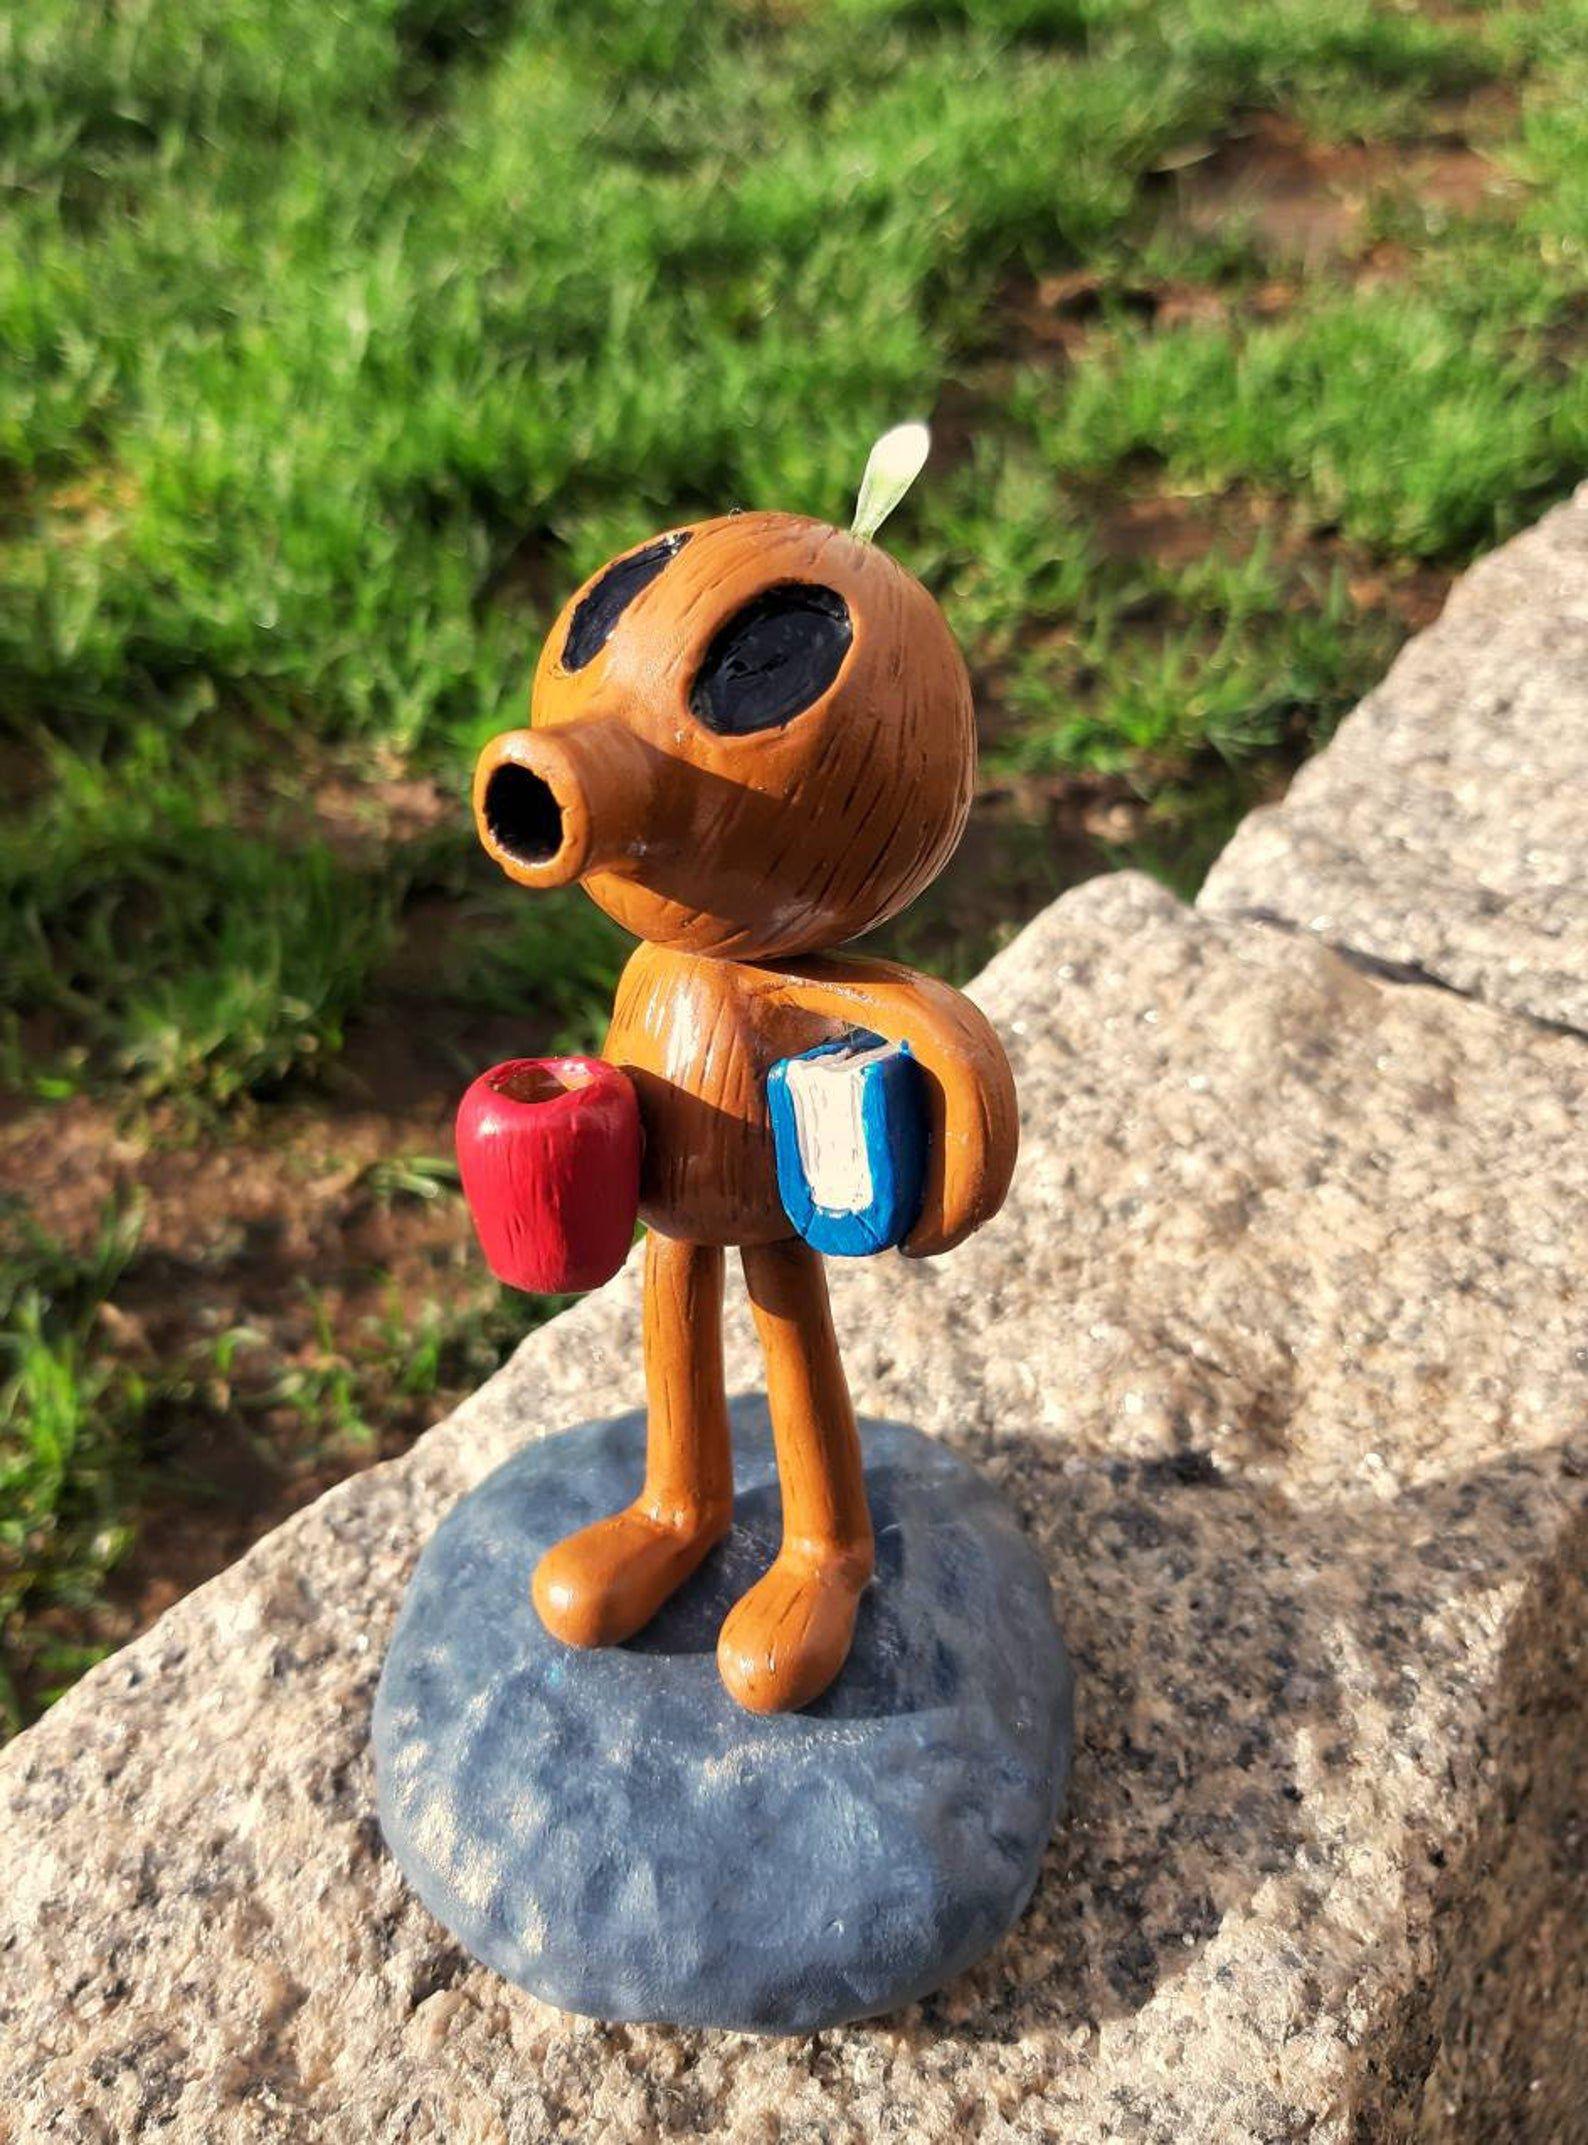 Wood Man figure from Hilda comic